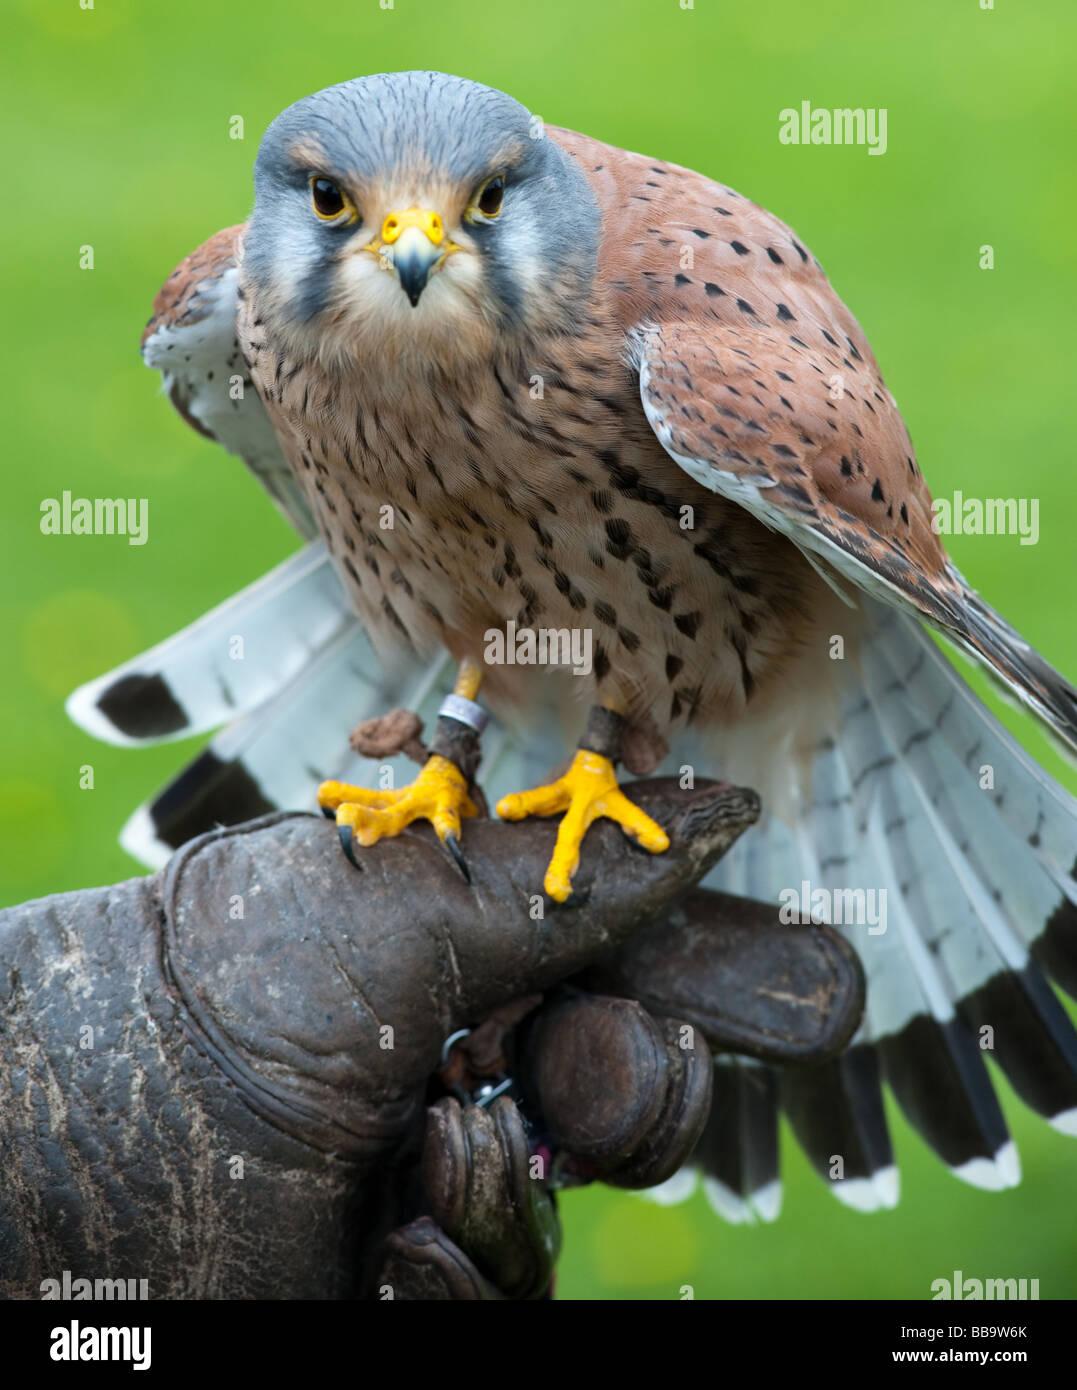 Falcon-Anzeige in Linlithgow Palace, Schottland Stockbild